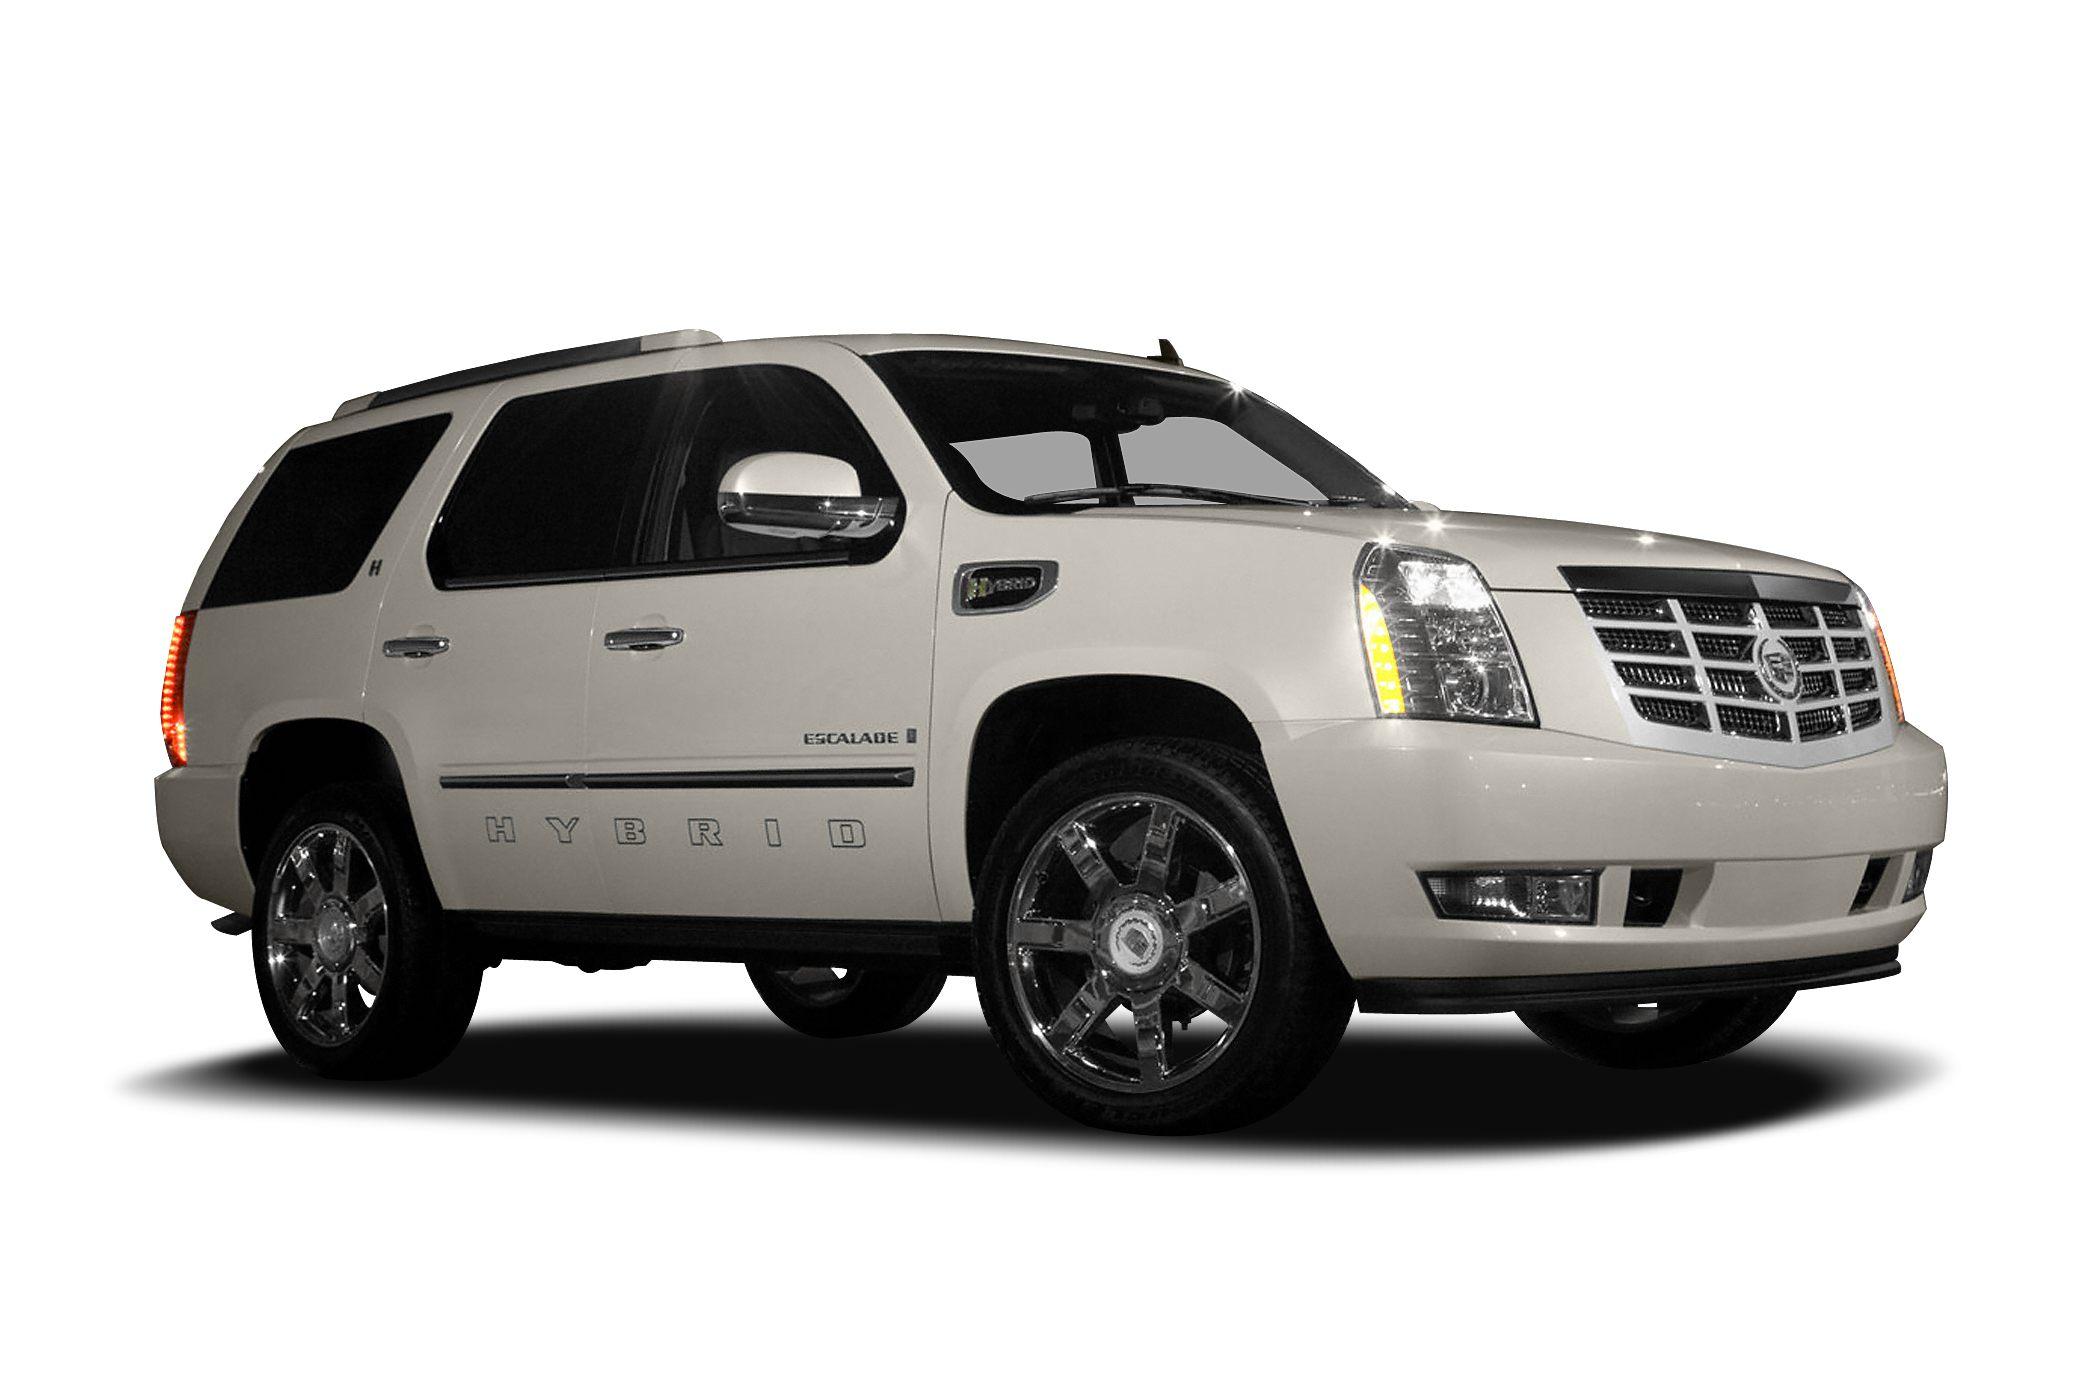 2009 Cadillac Escalade Hybrid Specs